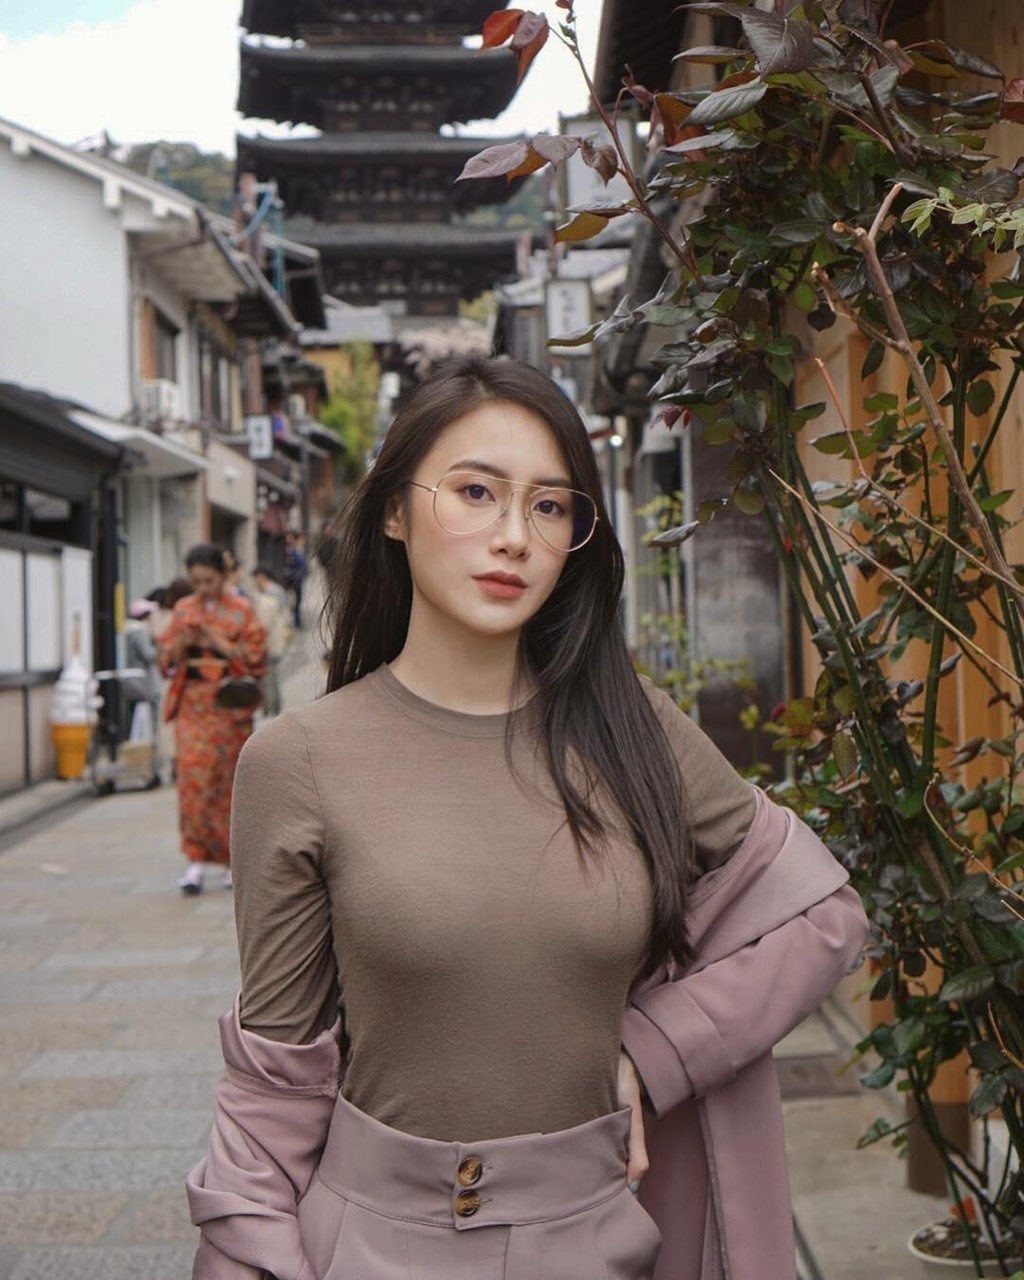 Ngam hinh check-in du lich sang chanh cua hot girl Lao goc Viet hinh anh 3